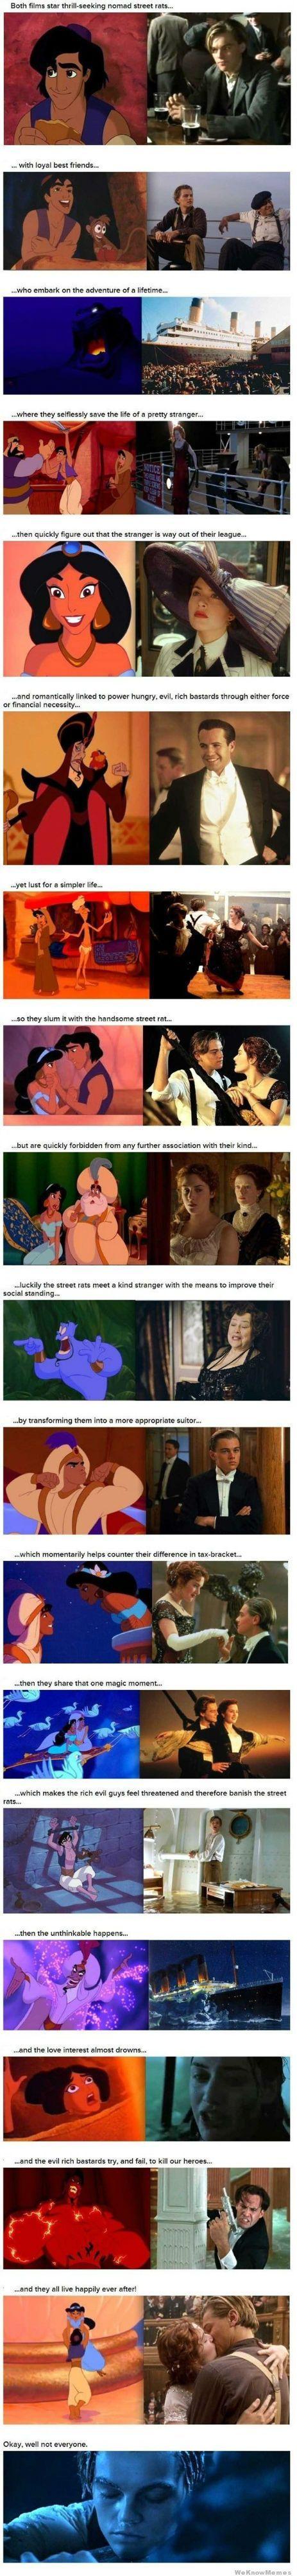 18 reasons aladdin and titanic are the same movie